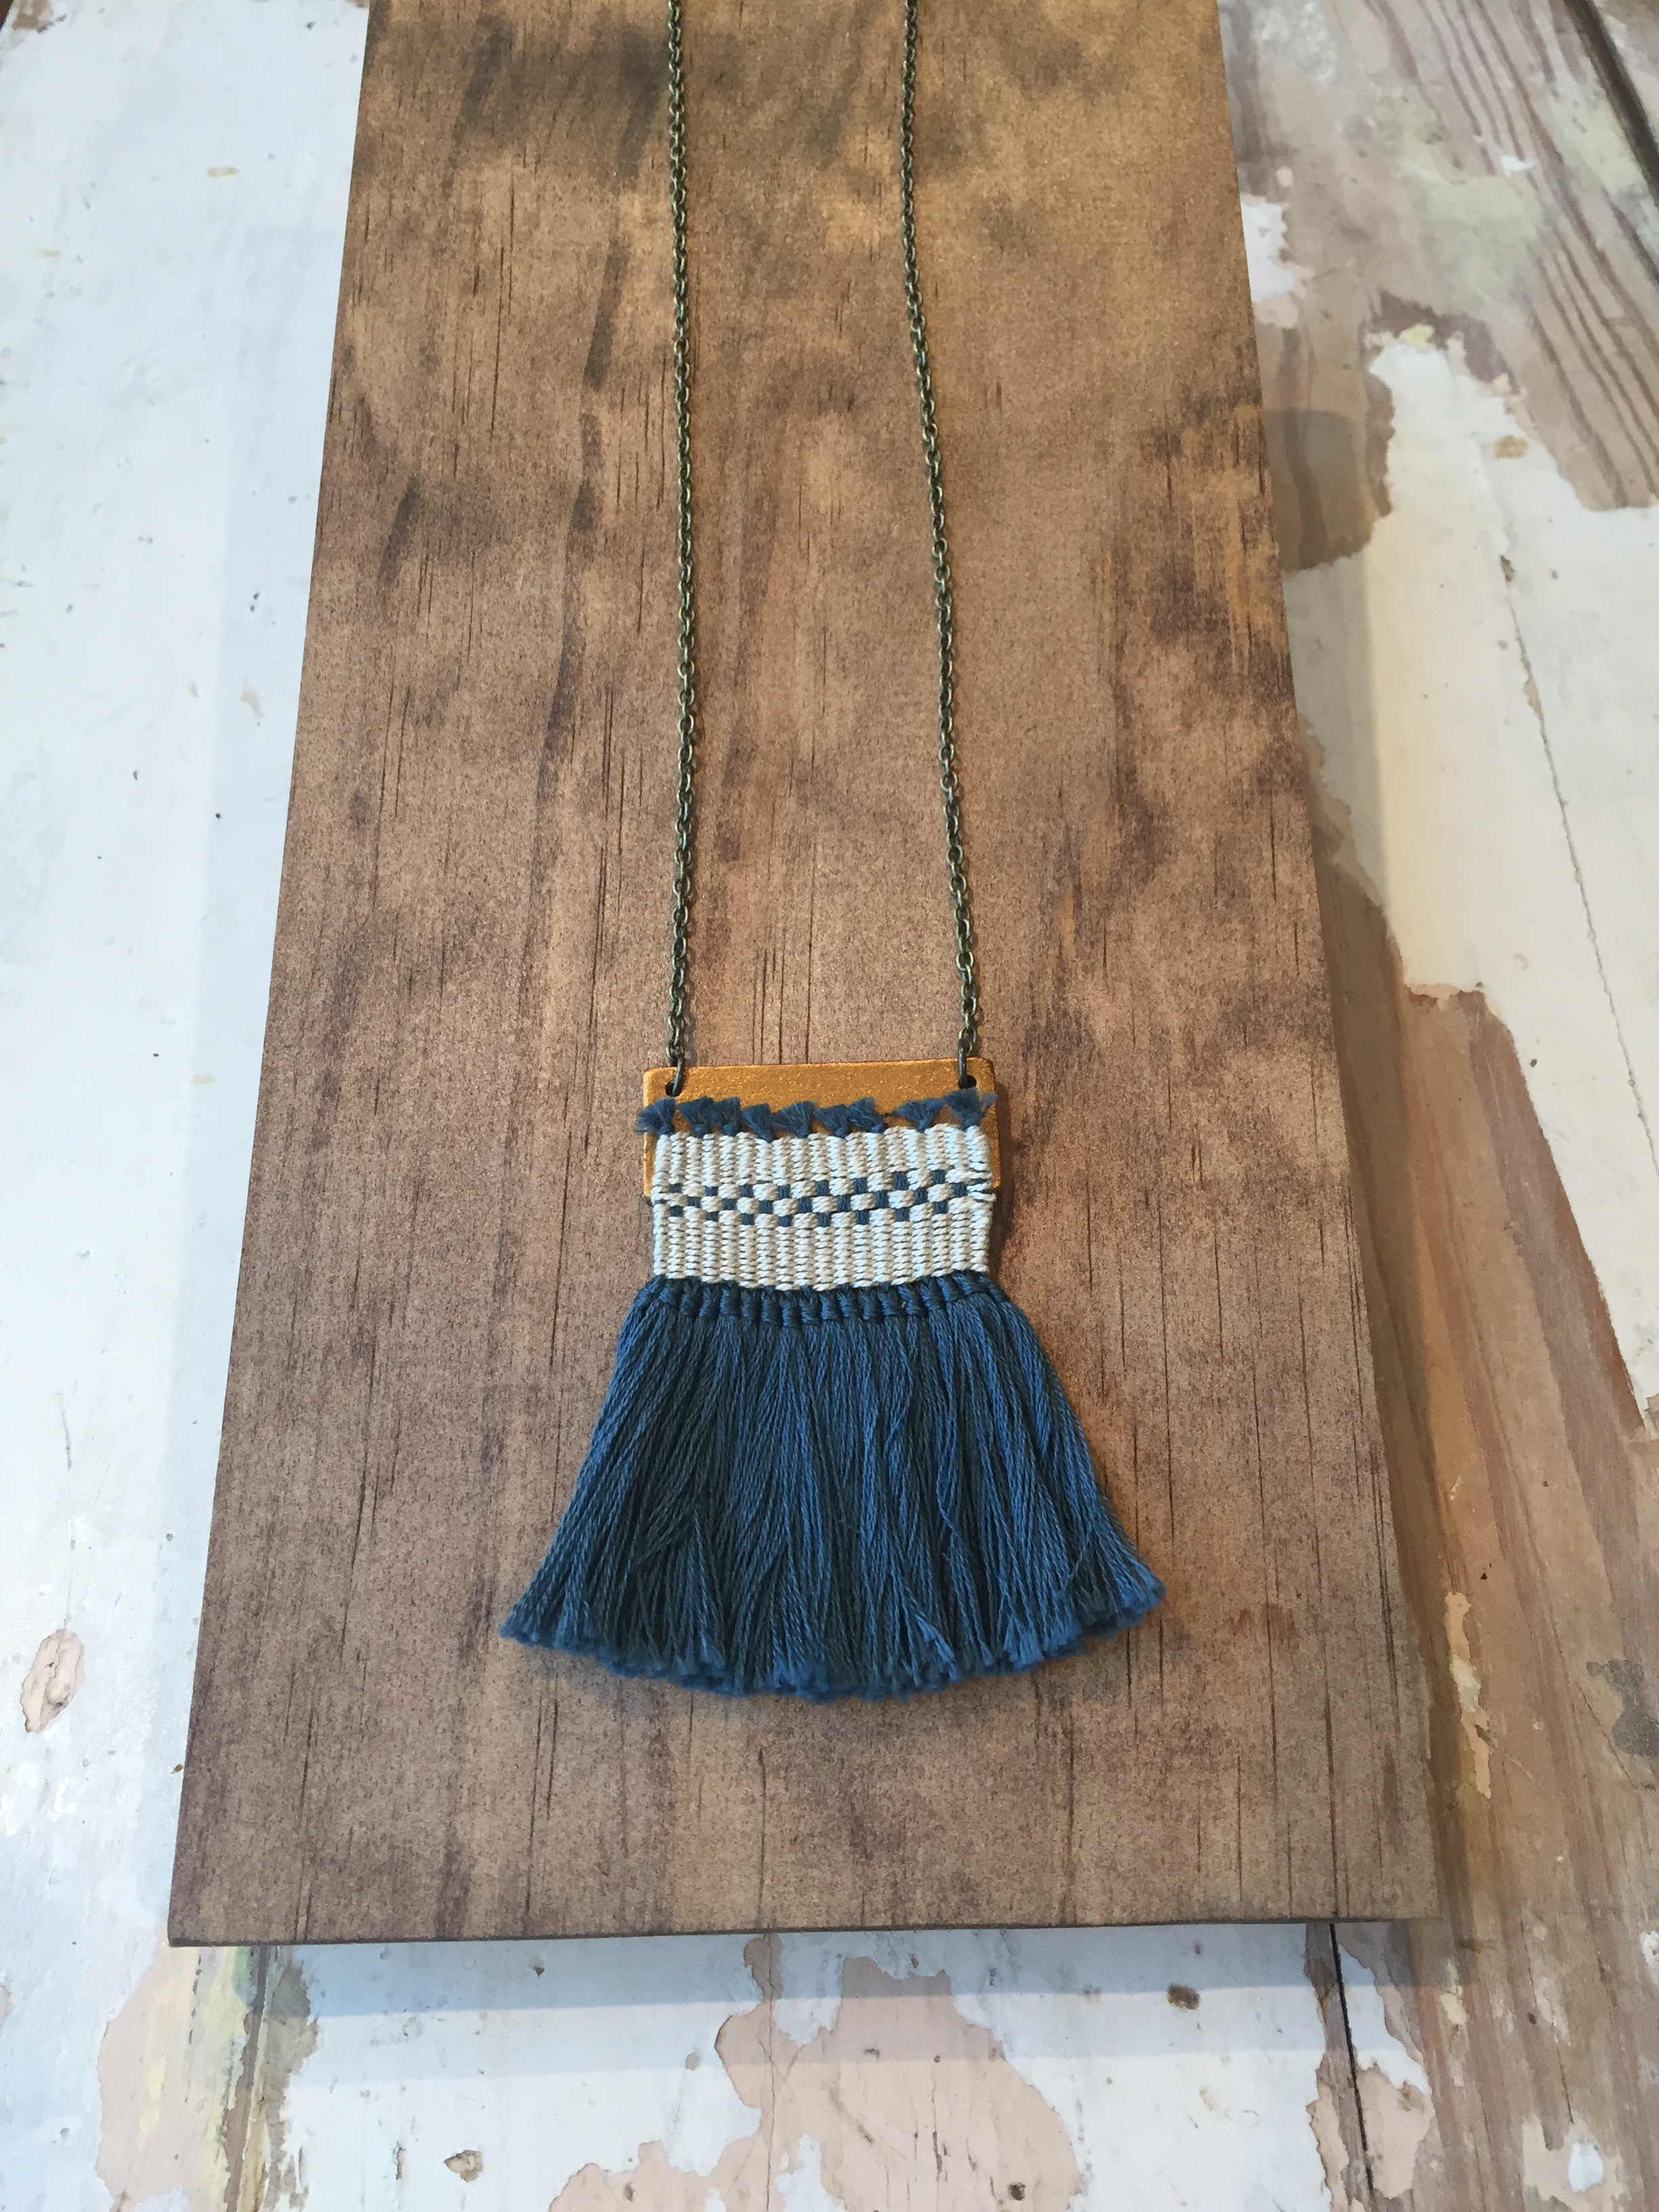 Mini-weaving necklace by Twenty Two West Studio